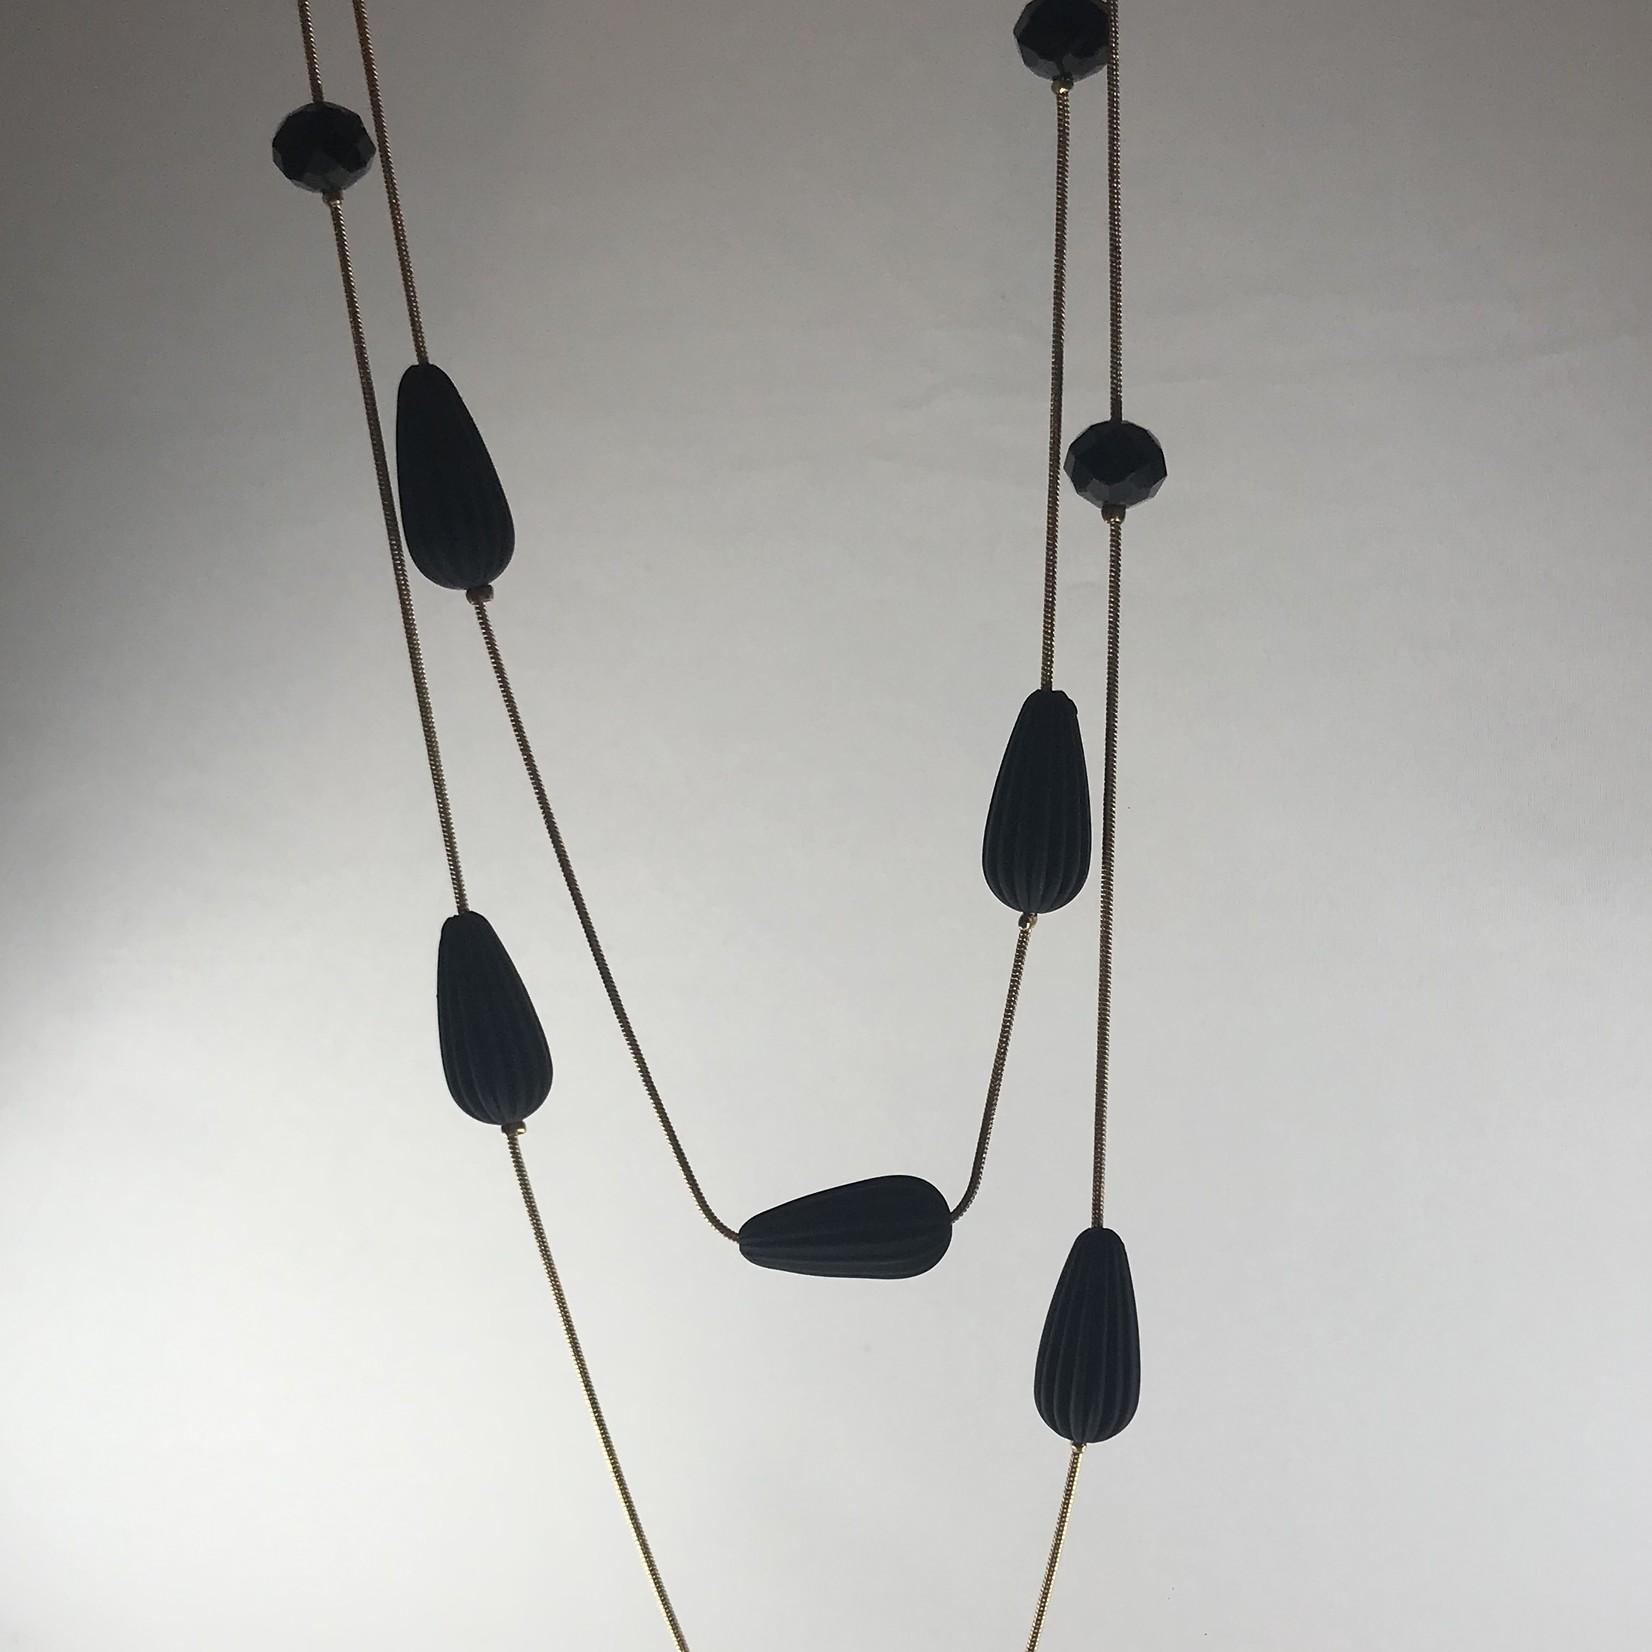 Axxes-Soir Ketting goudkleurig met zwarte parels